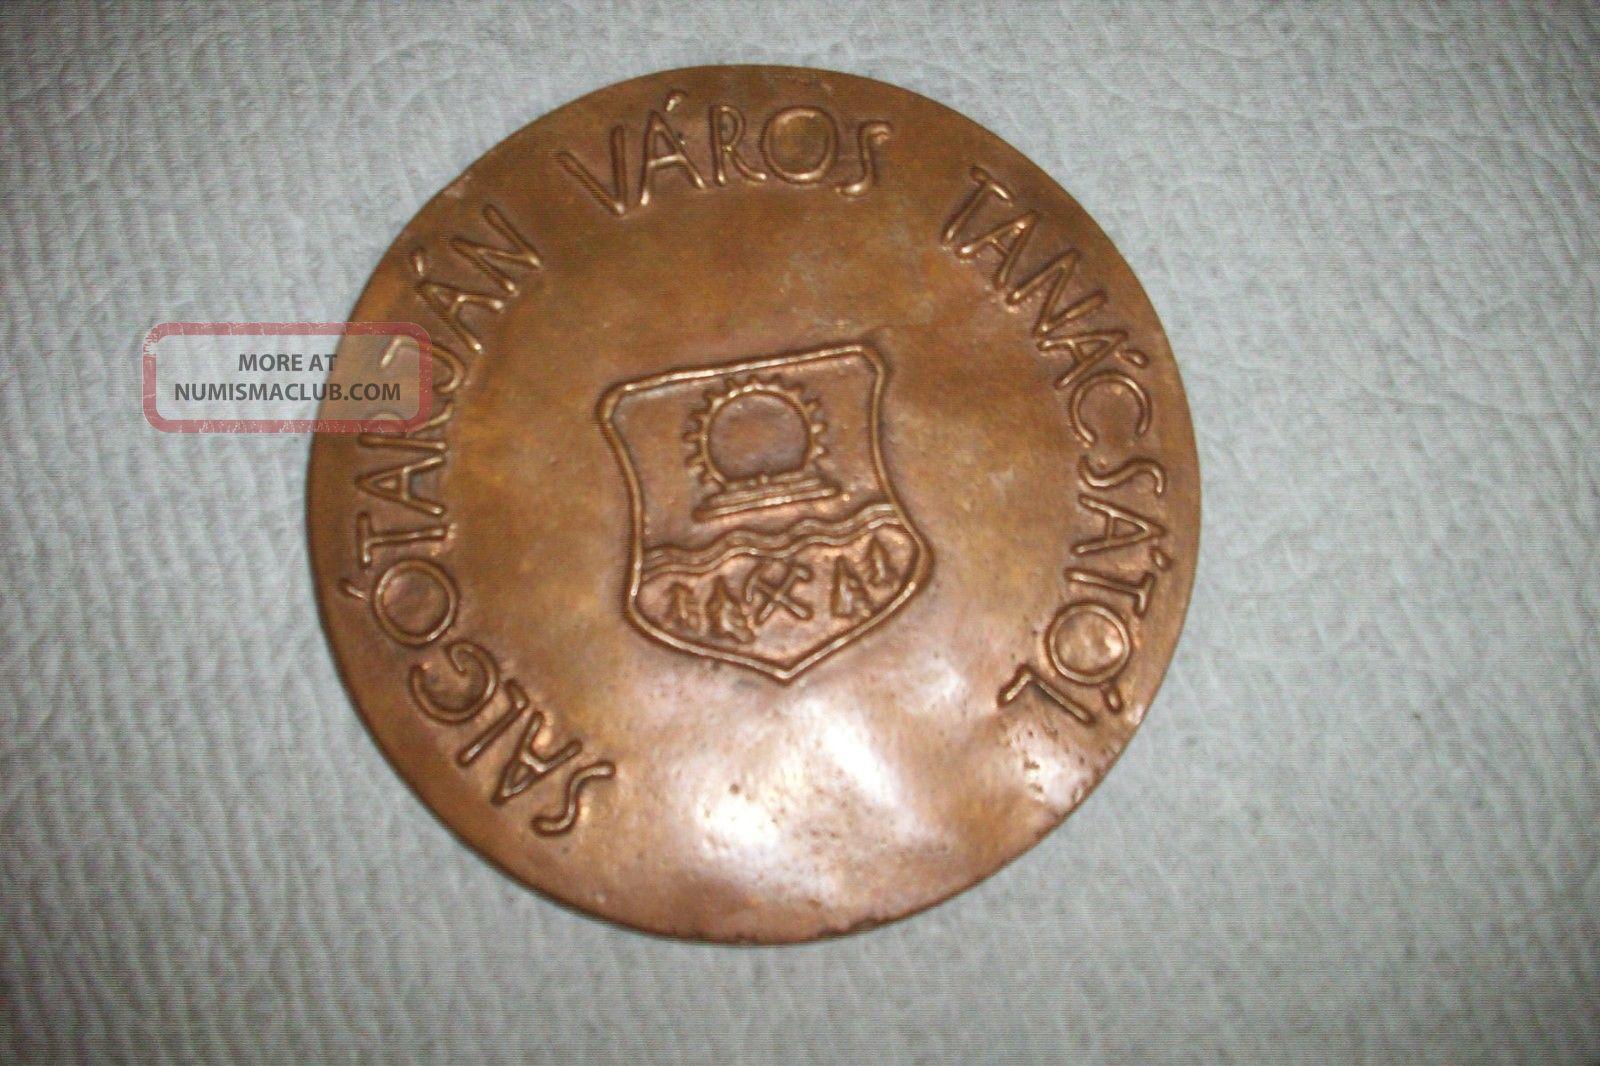 Hungary Salgotarjan Varos Tanacsatol Extra Large Bronze Medal Exonumia photo